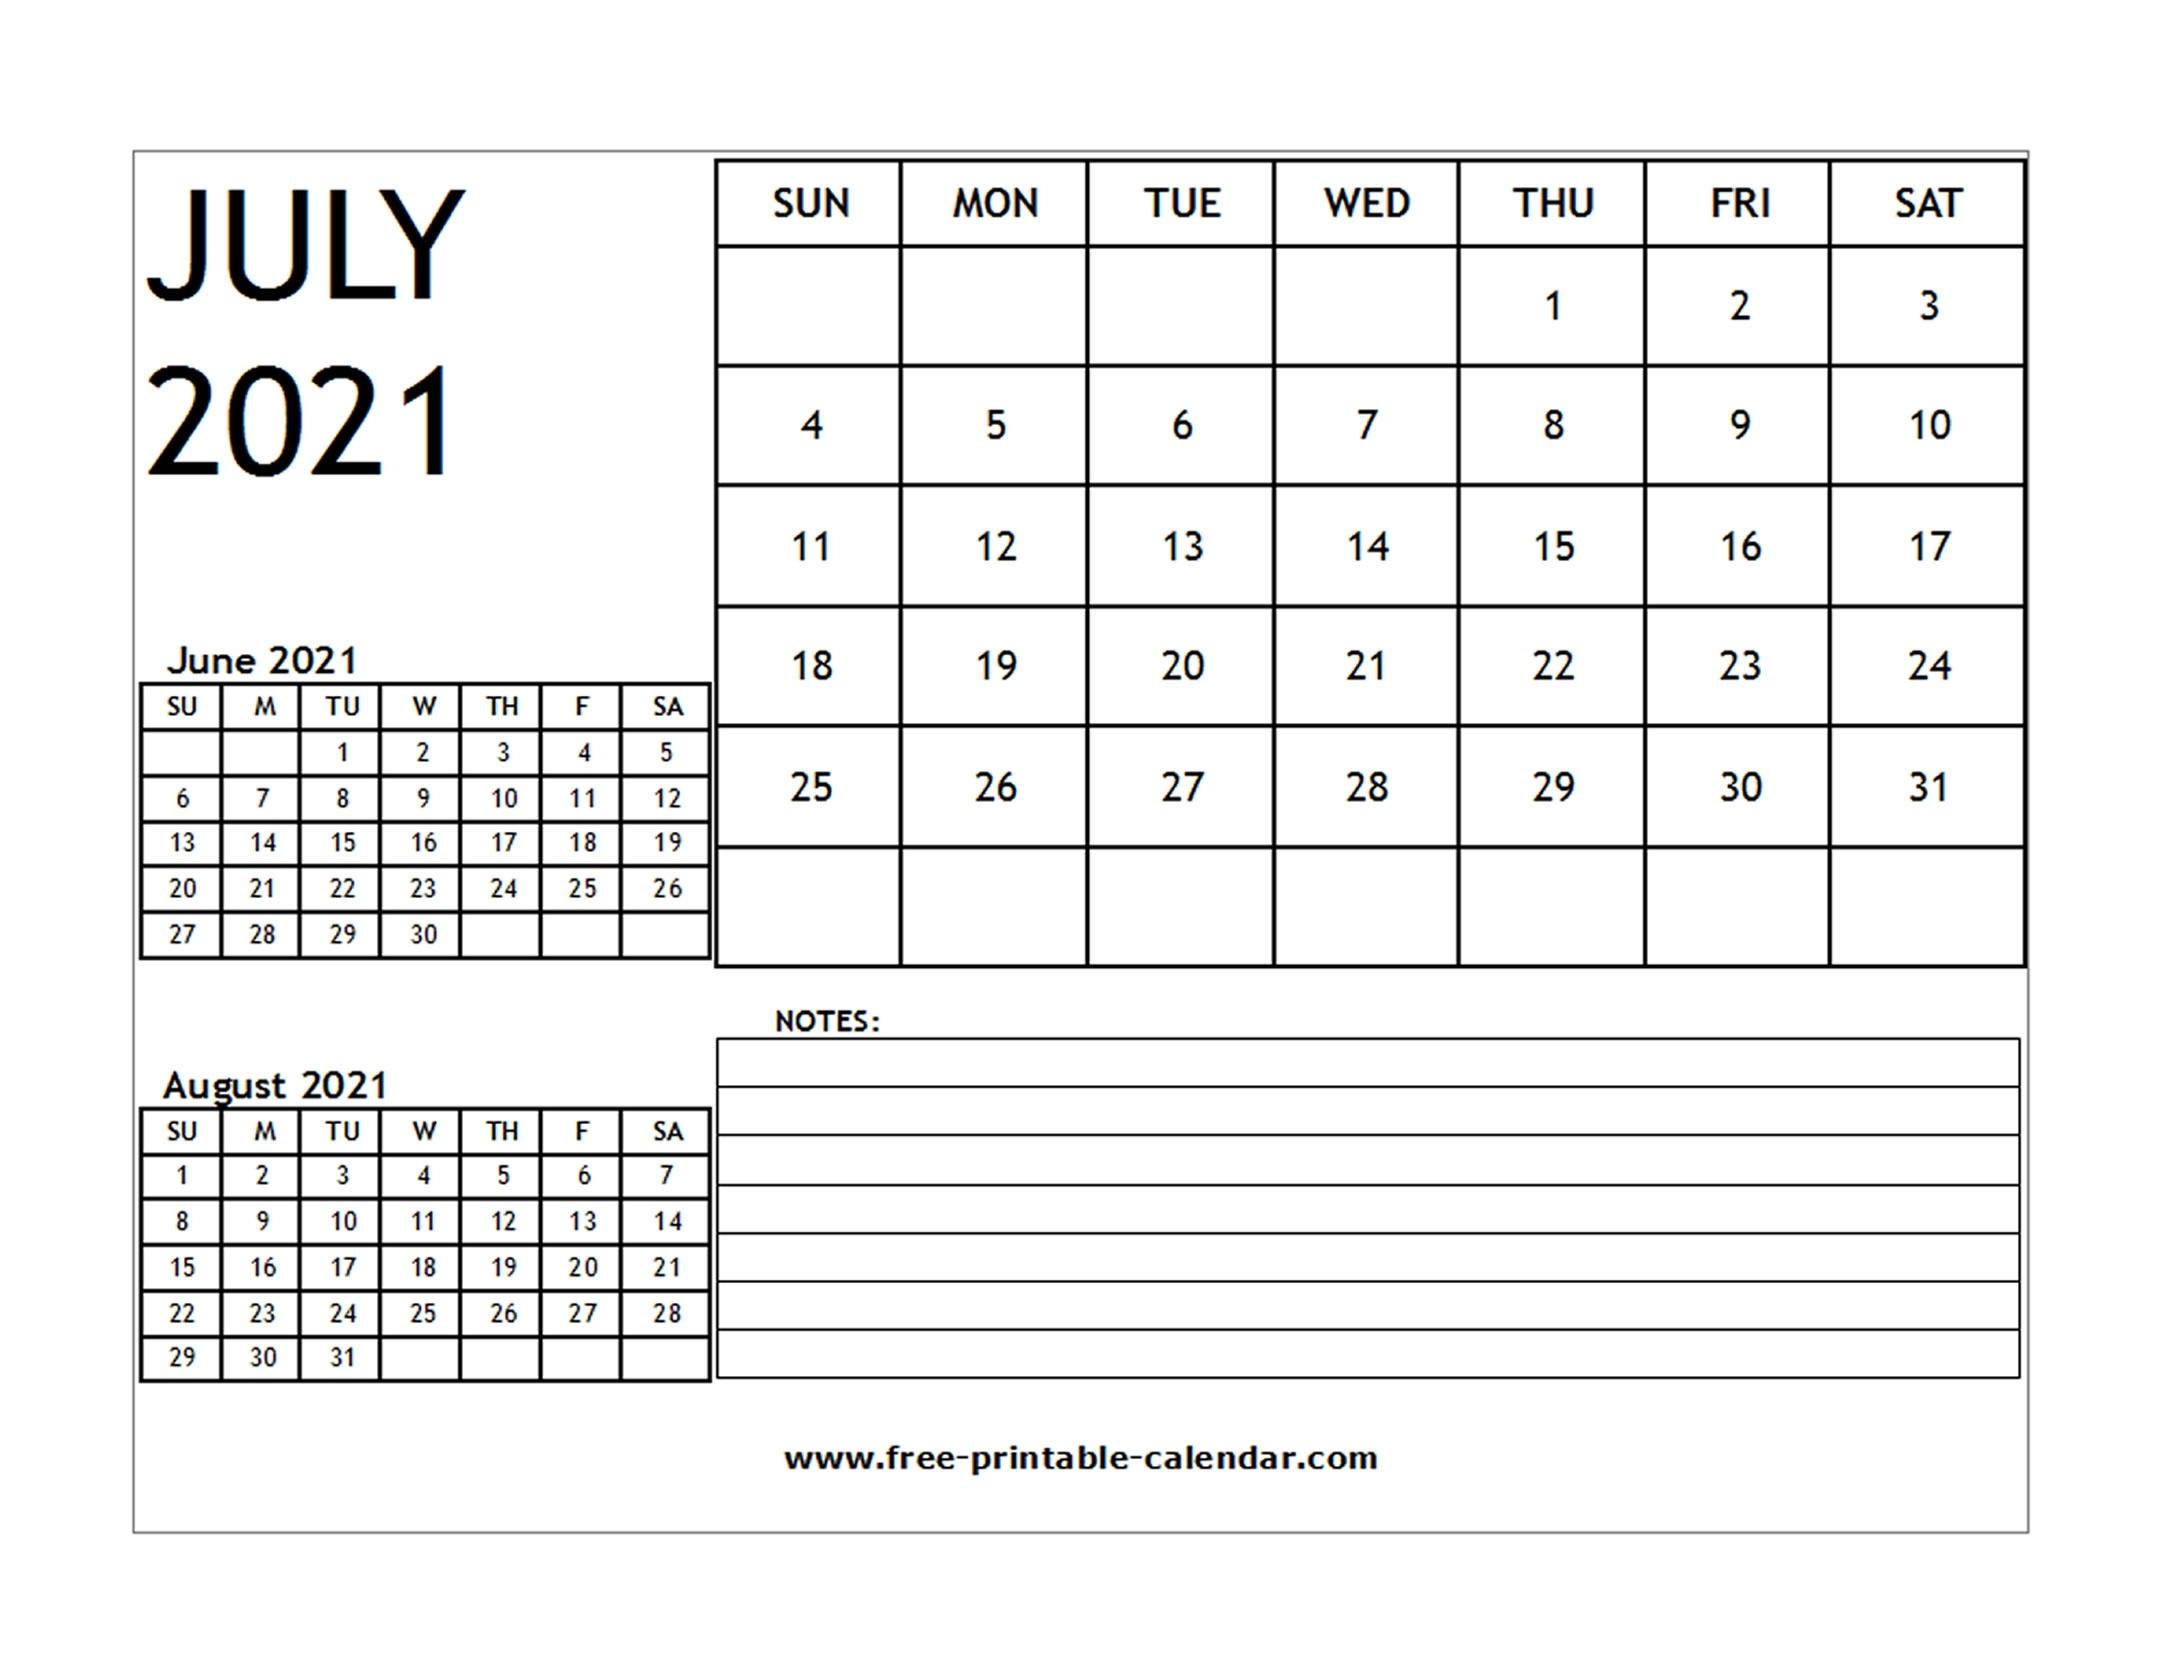 Blank 2021 Calendar July - Free-Printable-Calendar Editable July 2021 Calendar